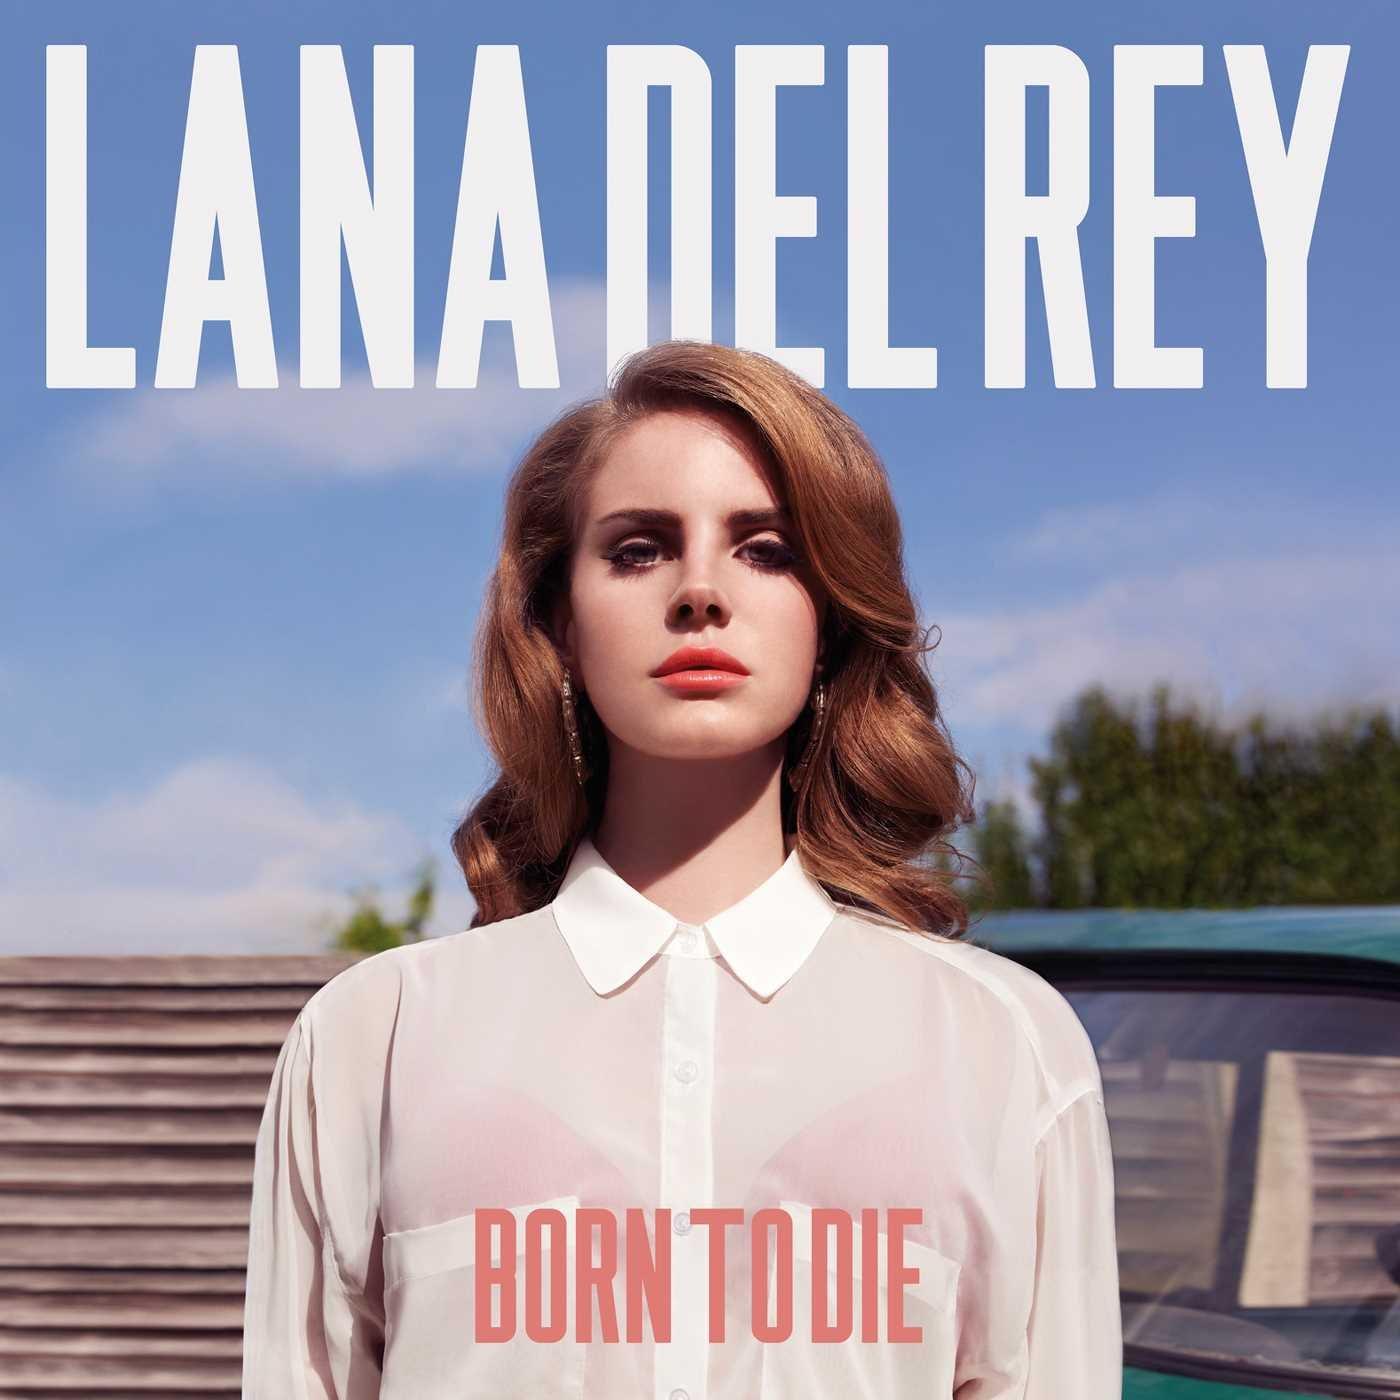 born to die lana del ray.jpg